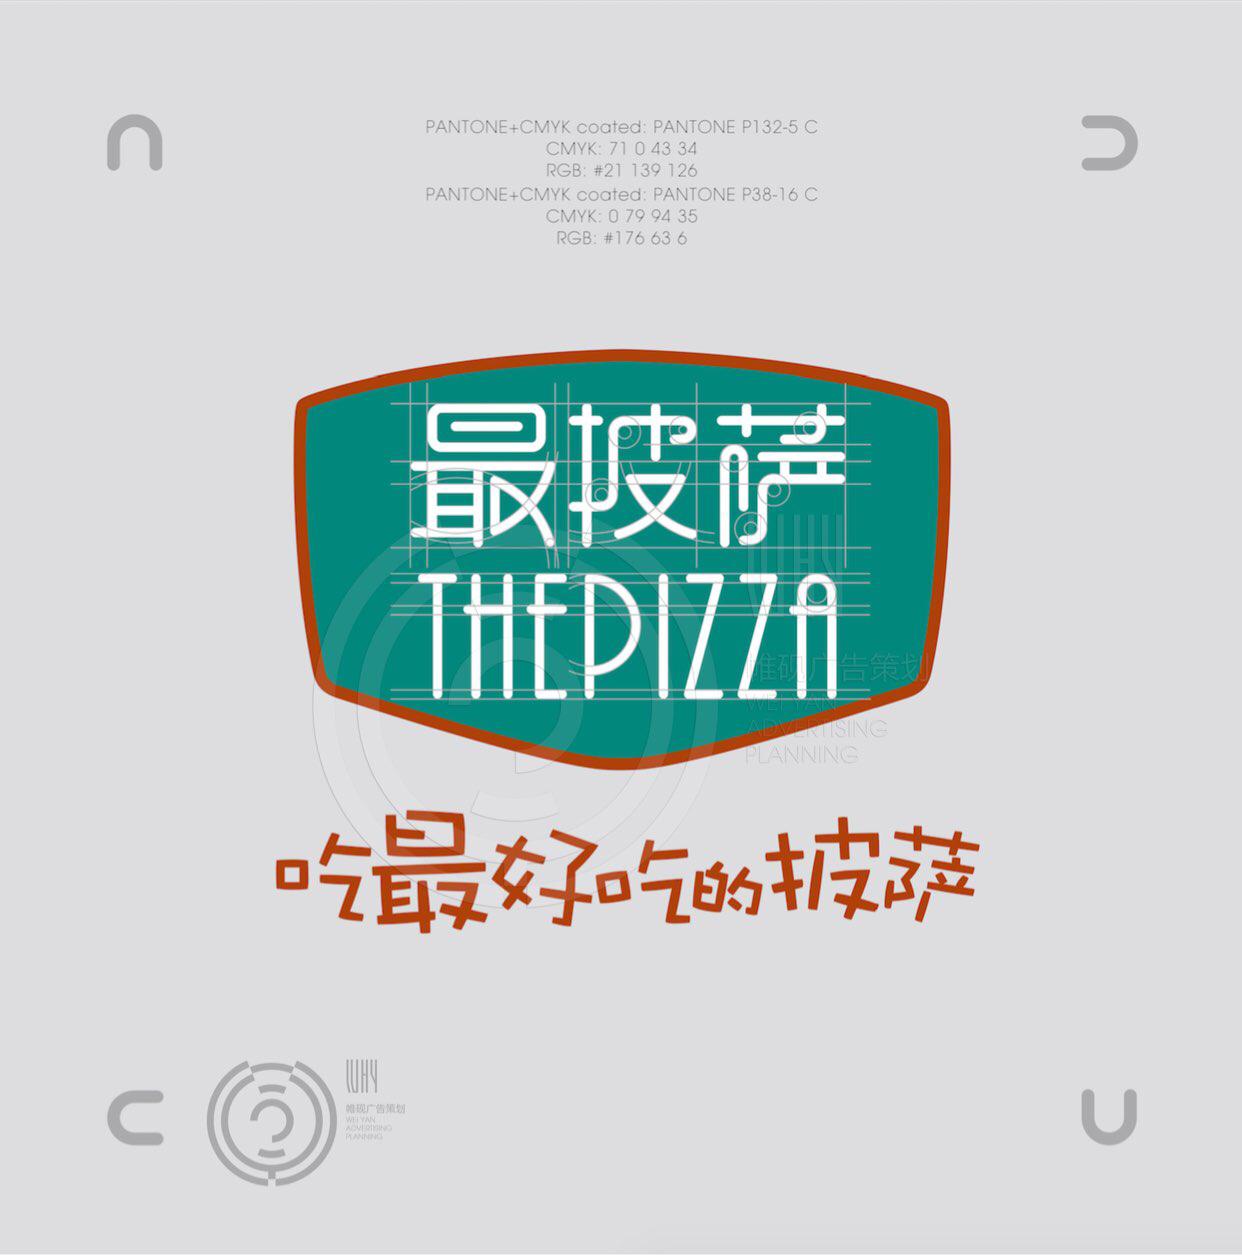 THEPIZZA最披萨VI视觉识别系统